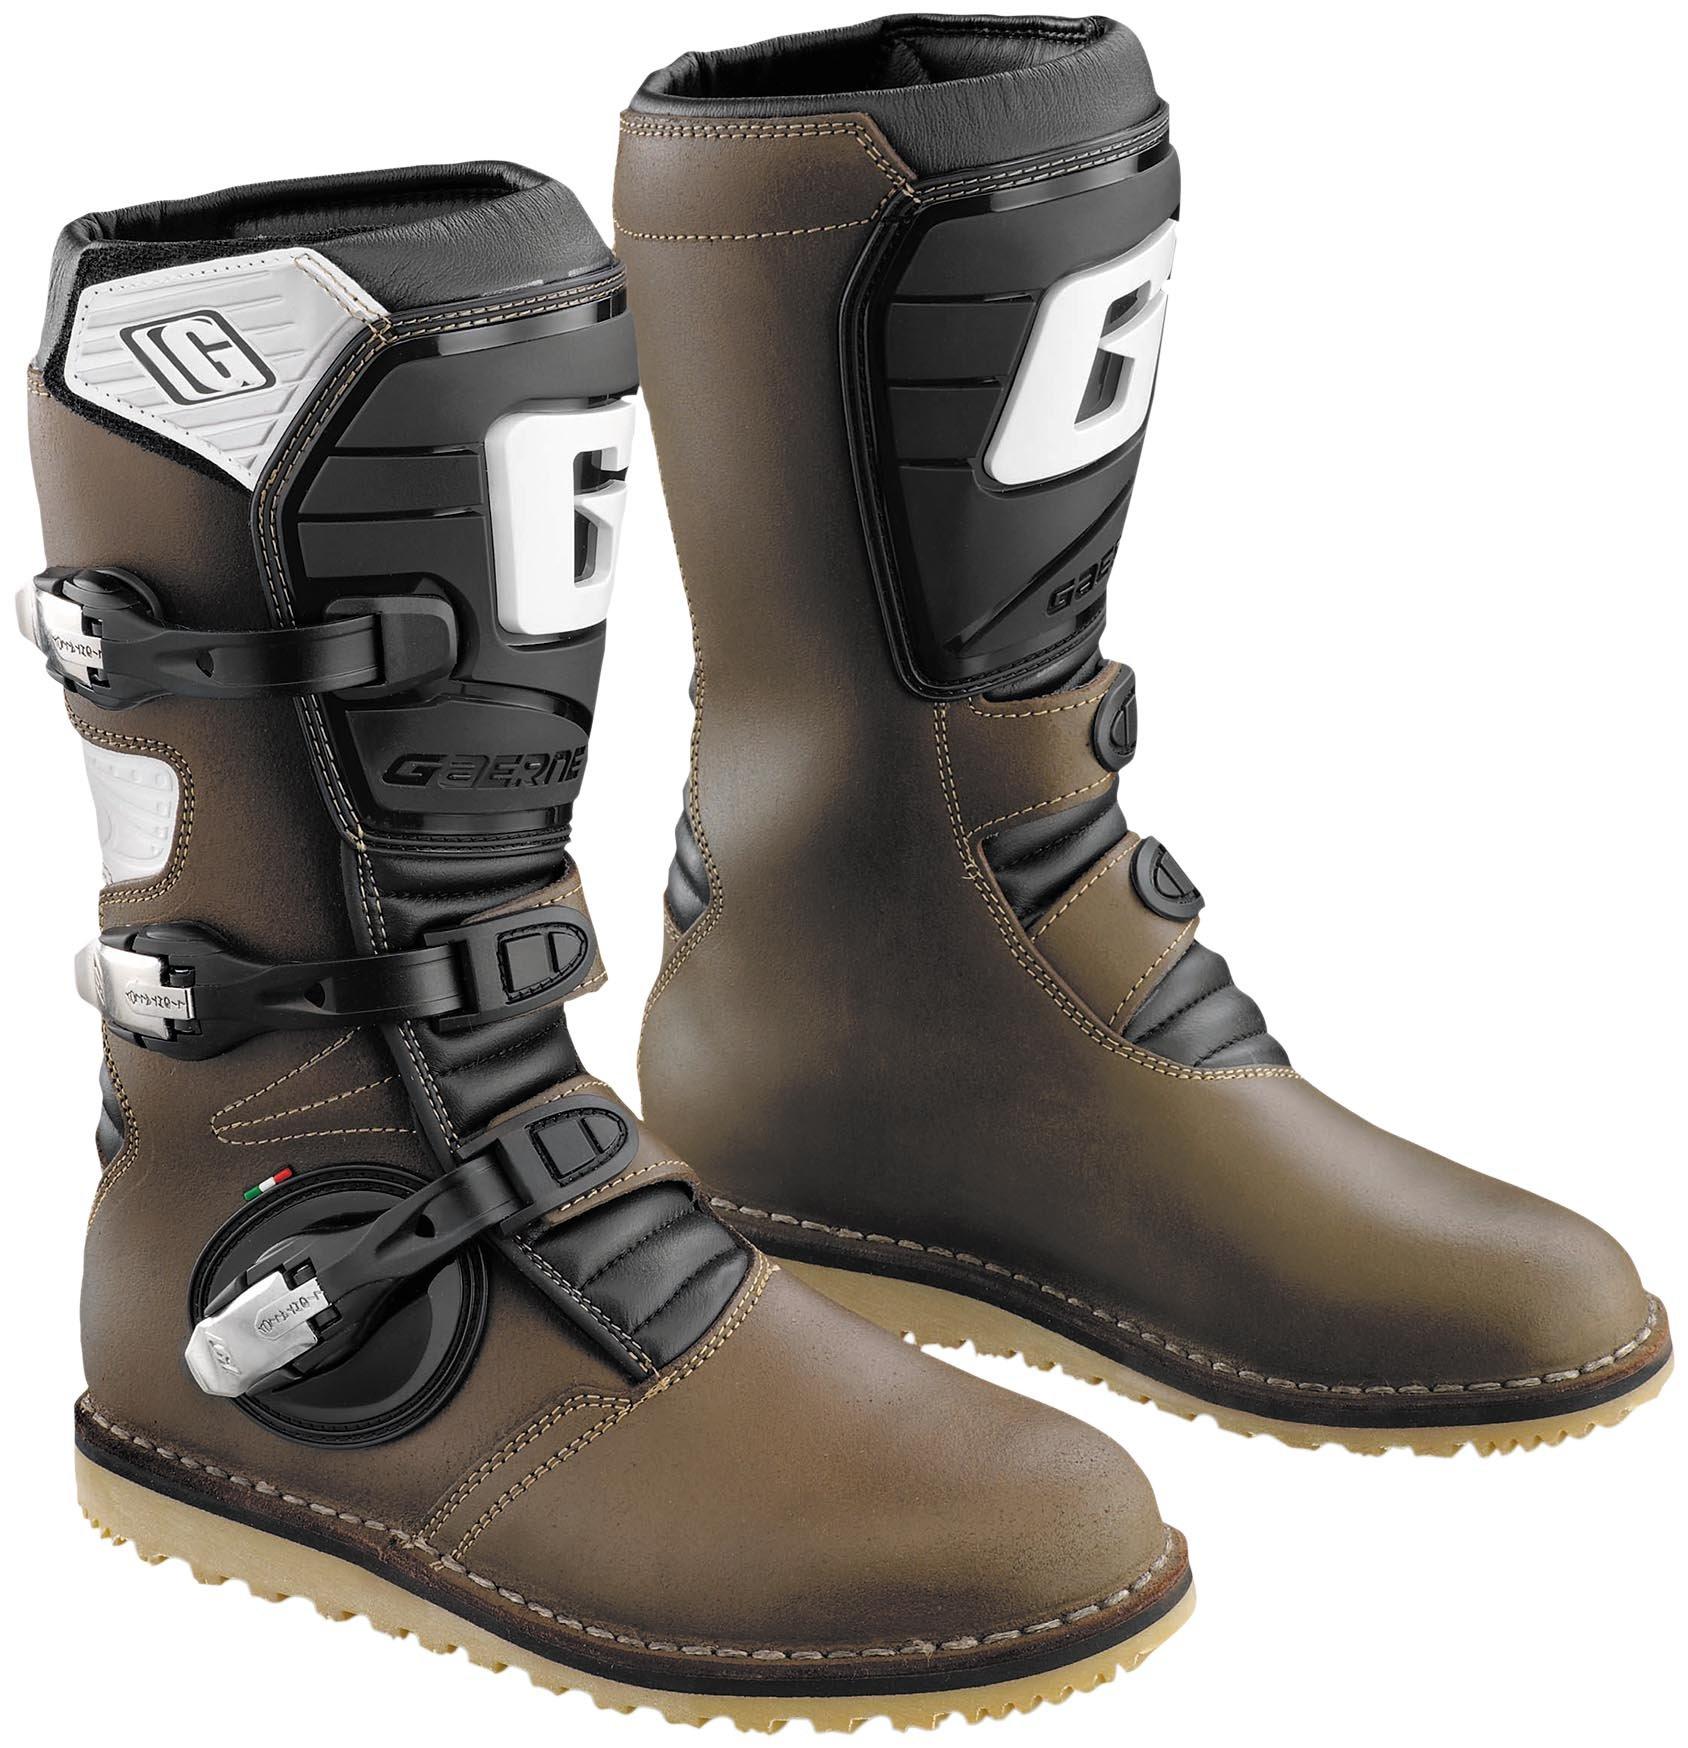 Gaerne Balance Pro Tech Boots BROWN